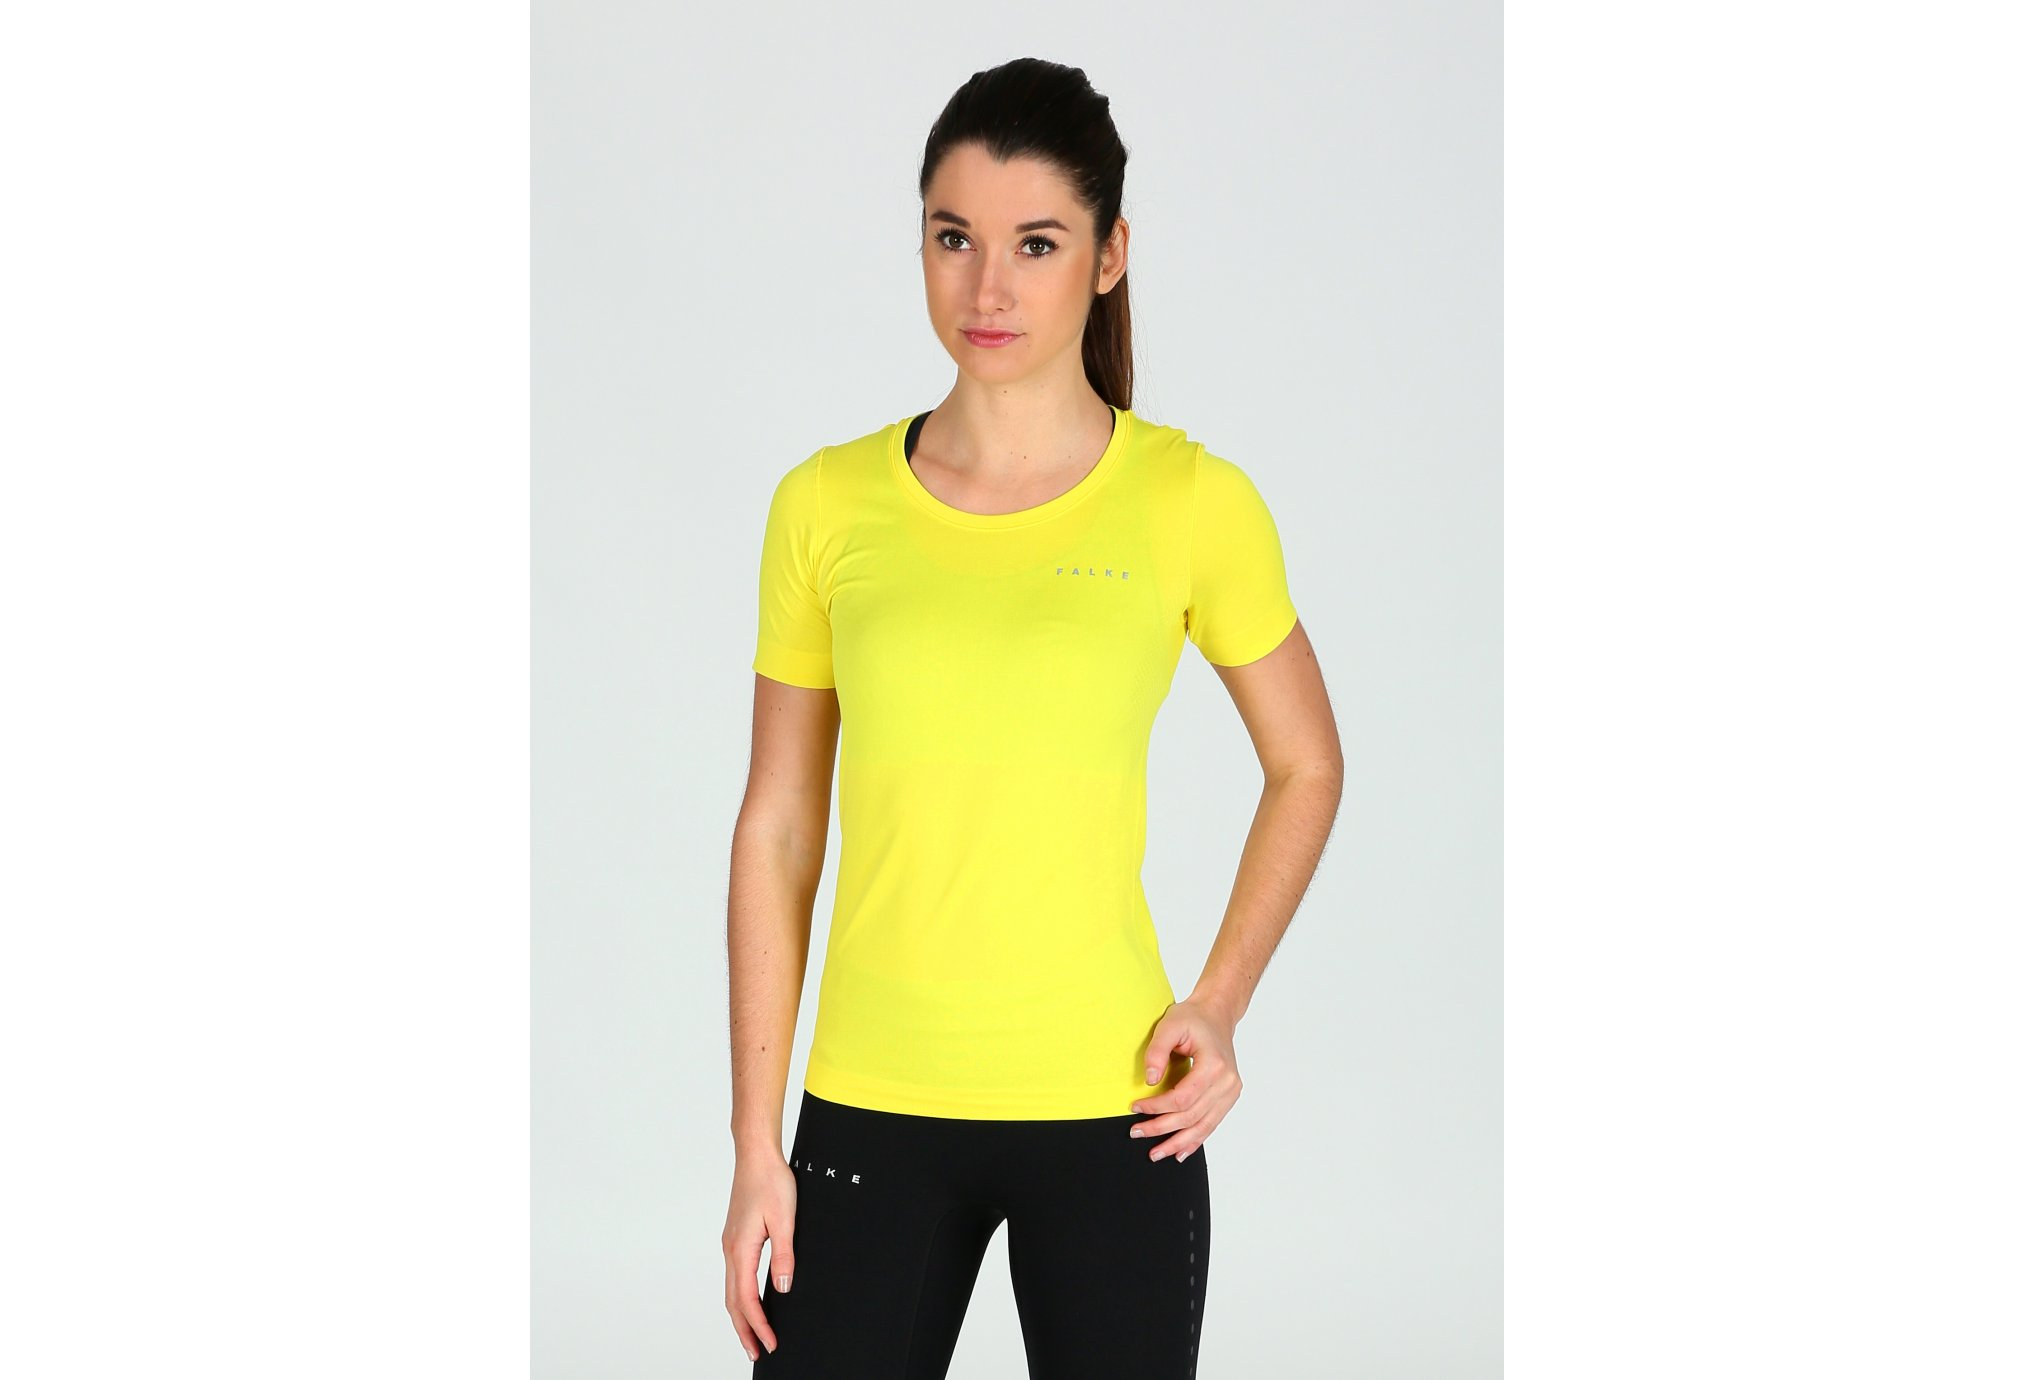 Falke Tee-shirt Energy W Diététique Vêtements femme